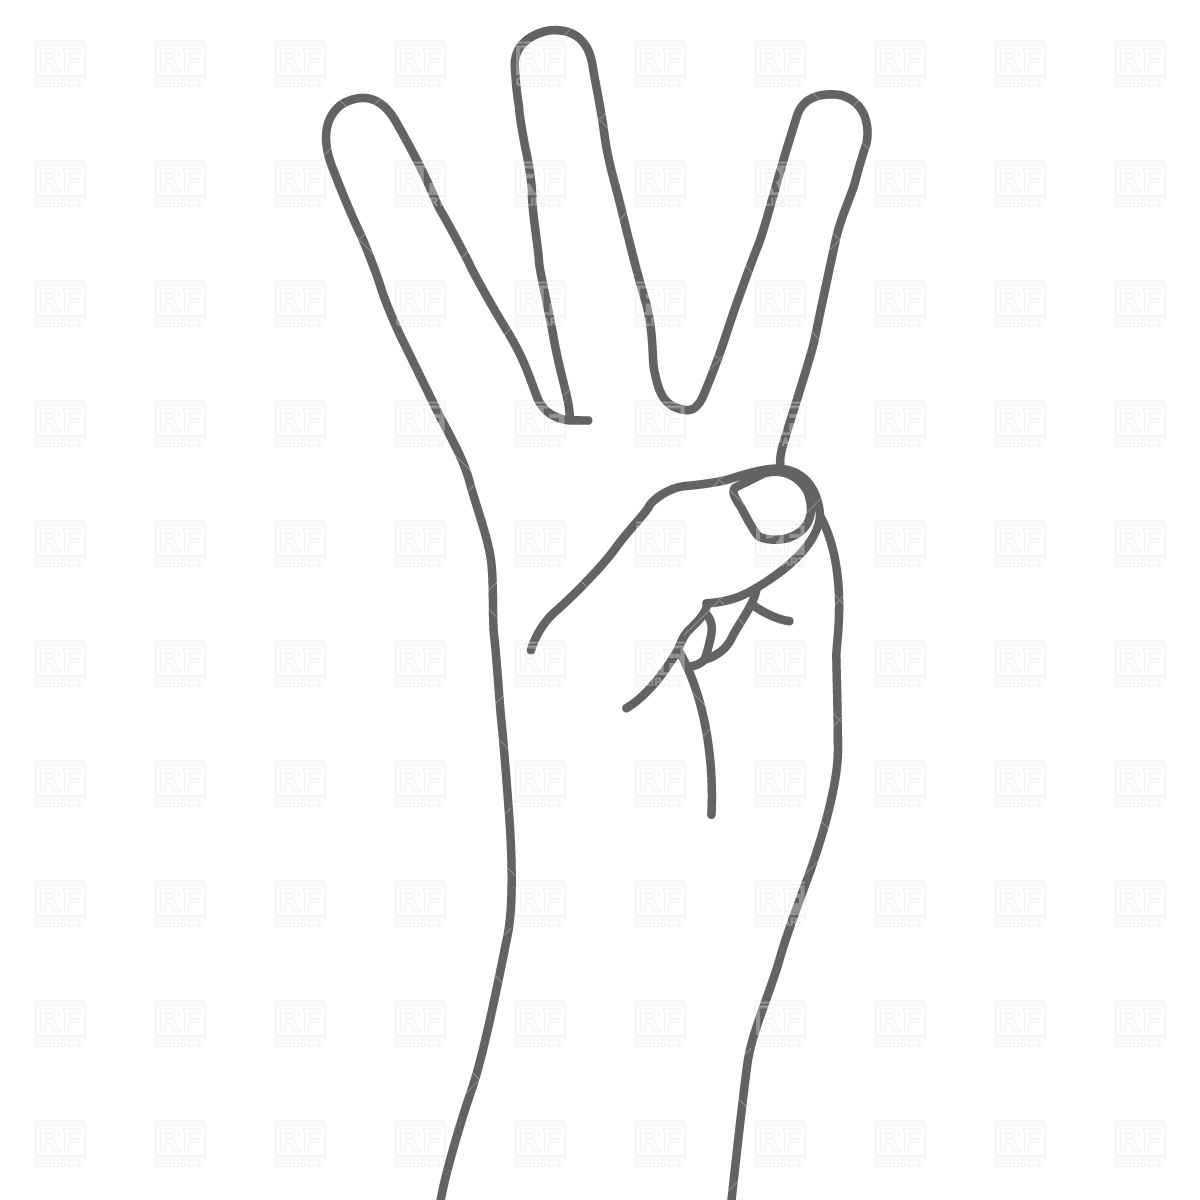 panda free images. Fingers clipart 1 finger